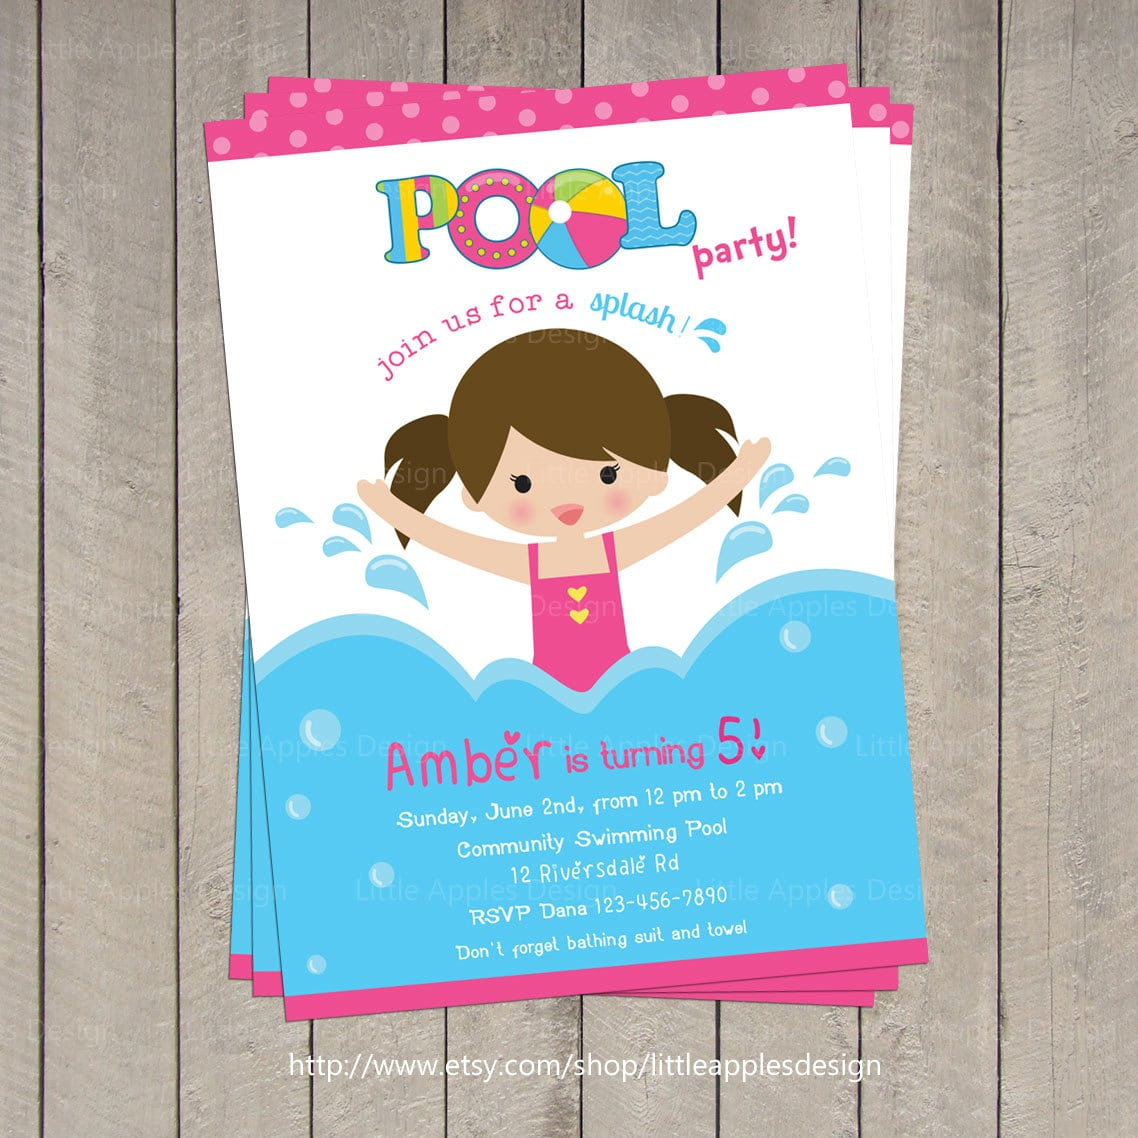 Pool Invitation   Pool Party Invitation   Kids Pool Party